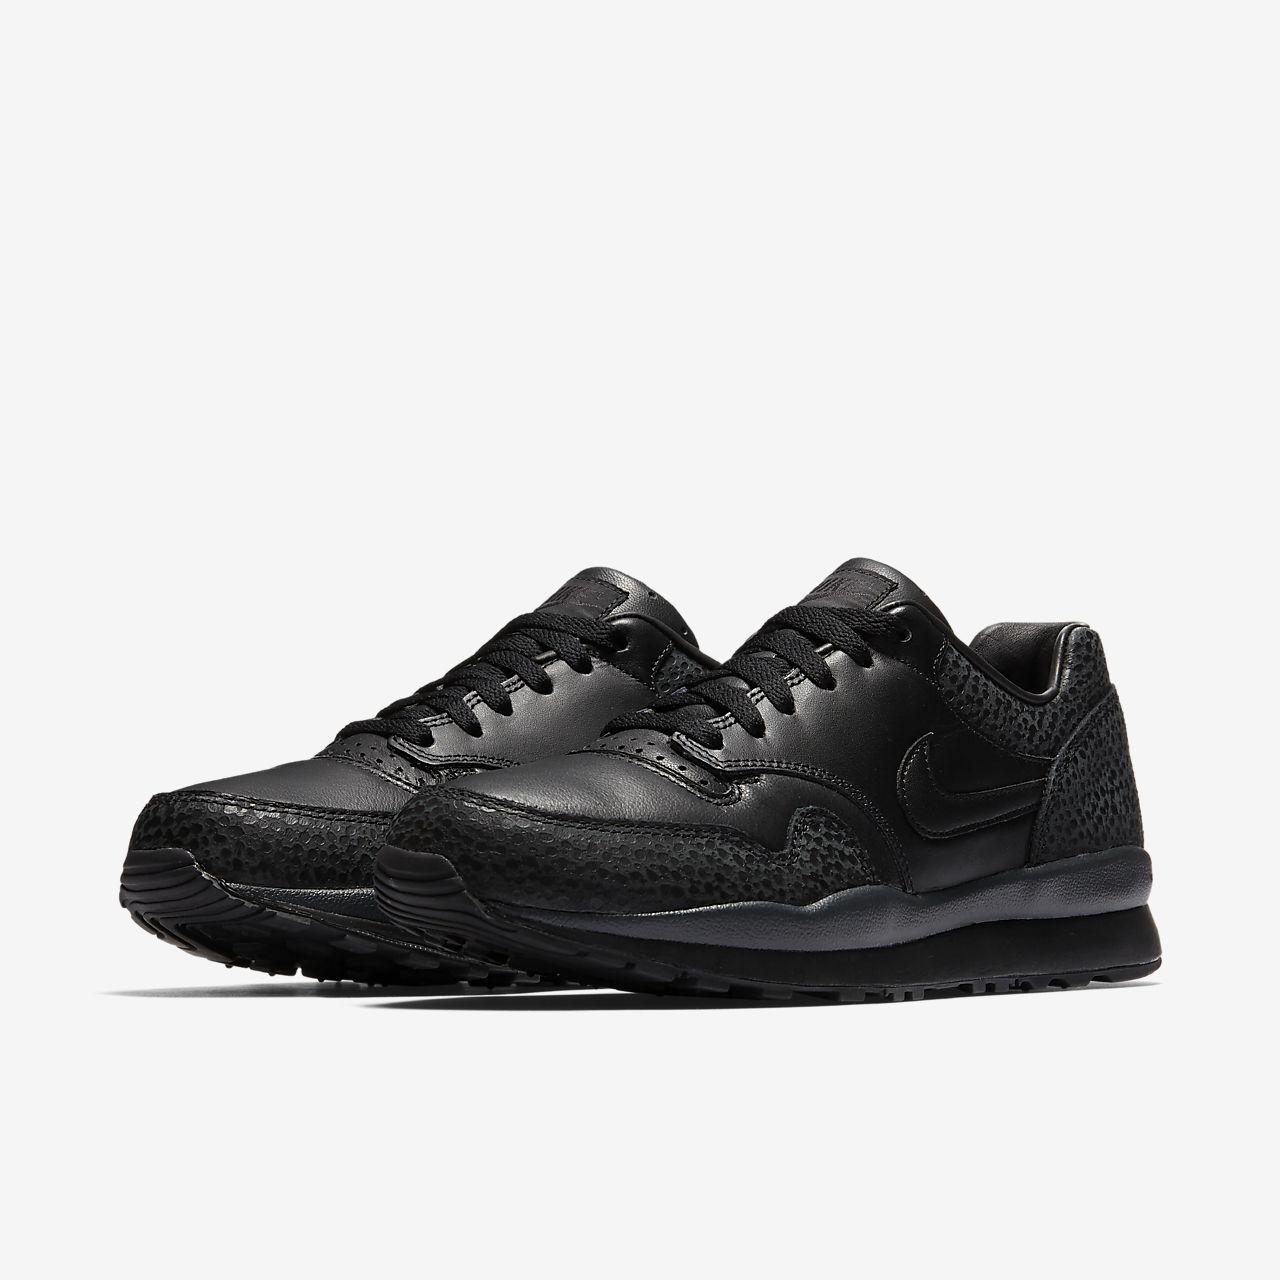 Safari Calzado Nike Air Para Hombre Qs lcK1TJF3